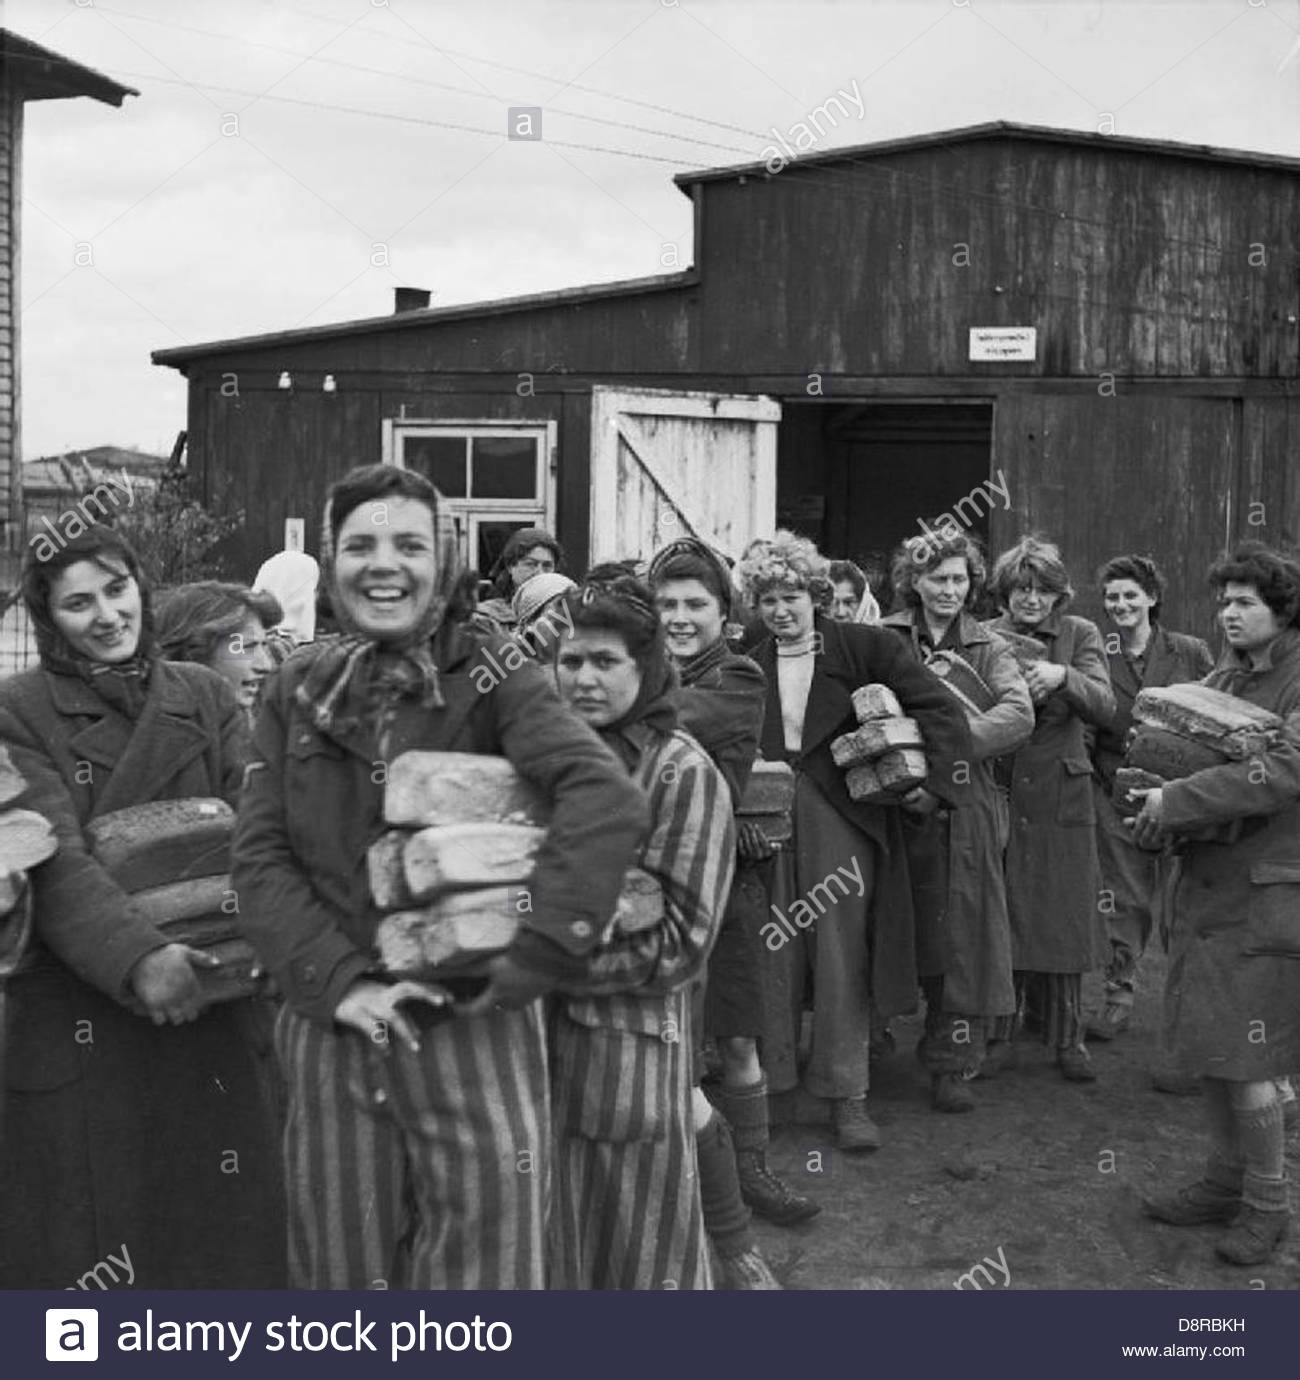 The Liberation of Bergen-belsen Concentration Camp, April 1945 BU4274. Stock Photo